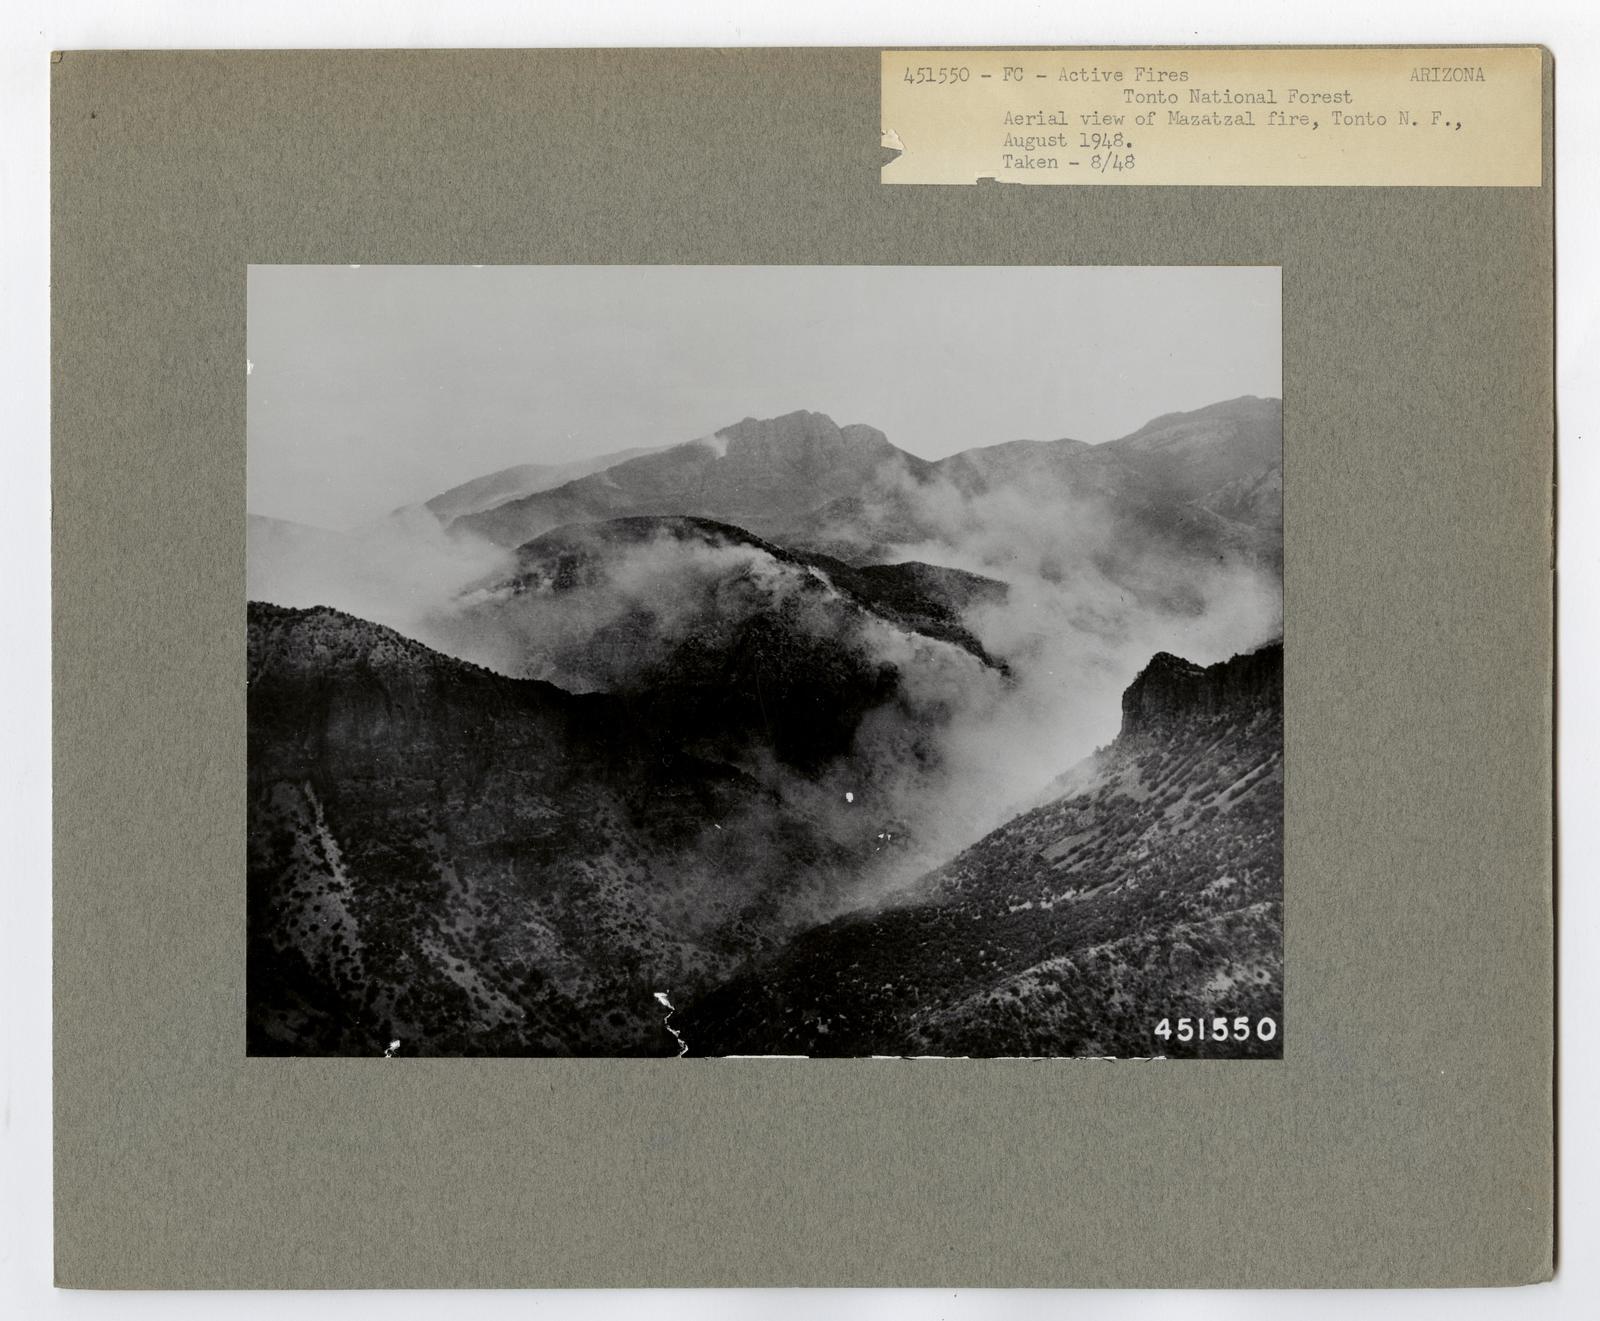 Active Fires - Arizona